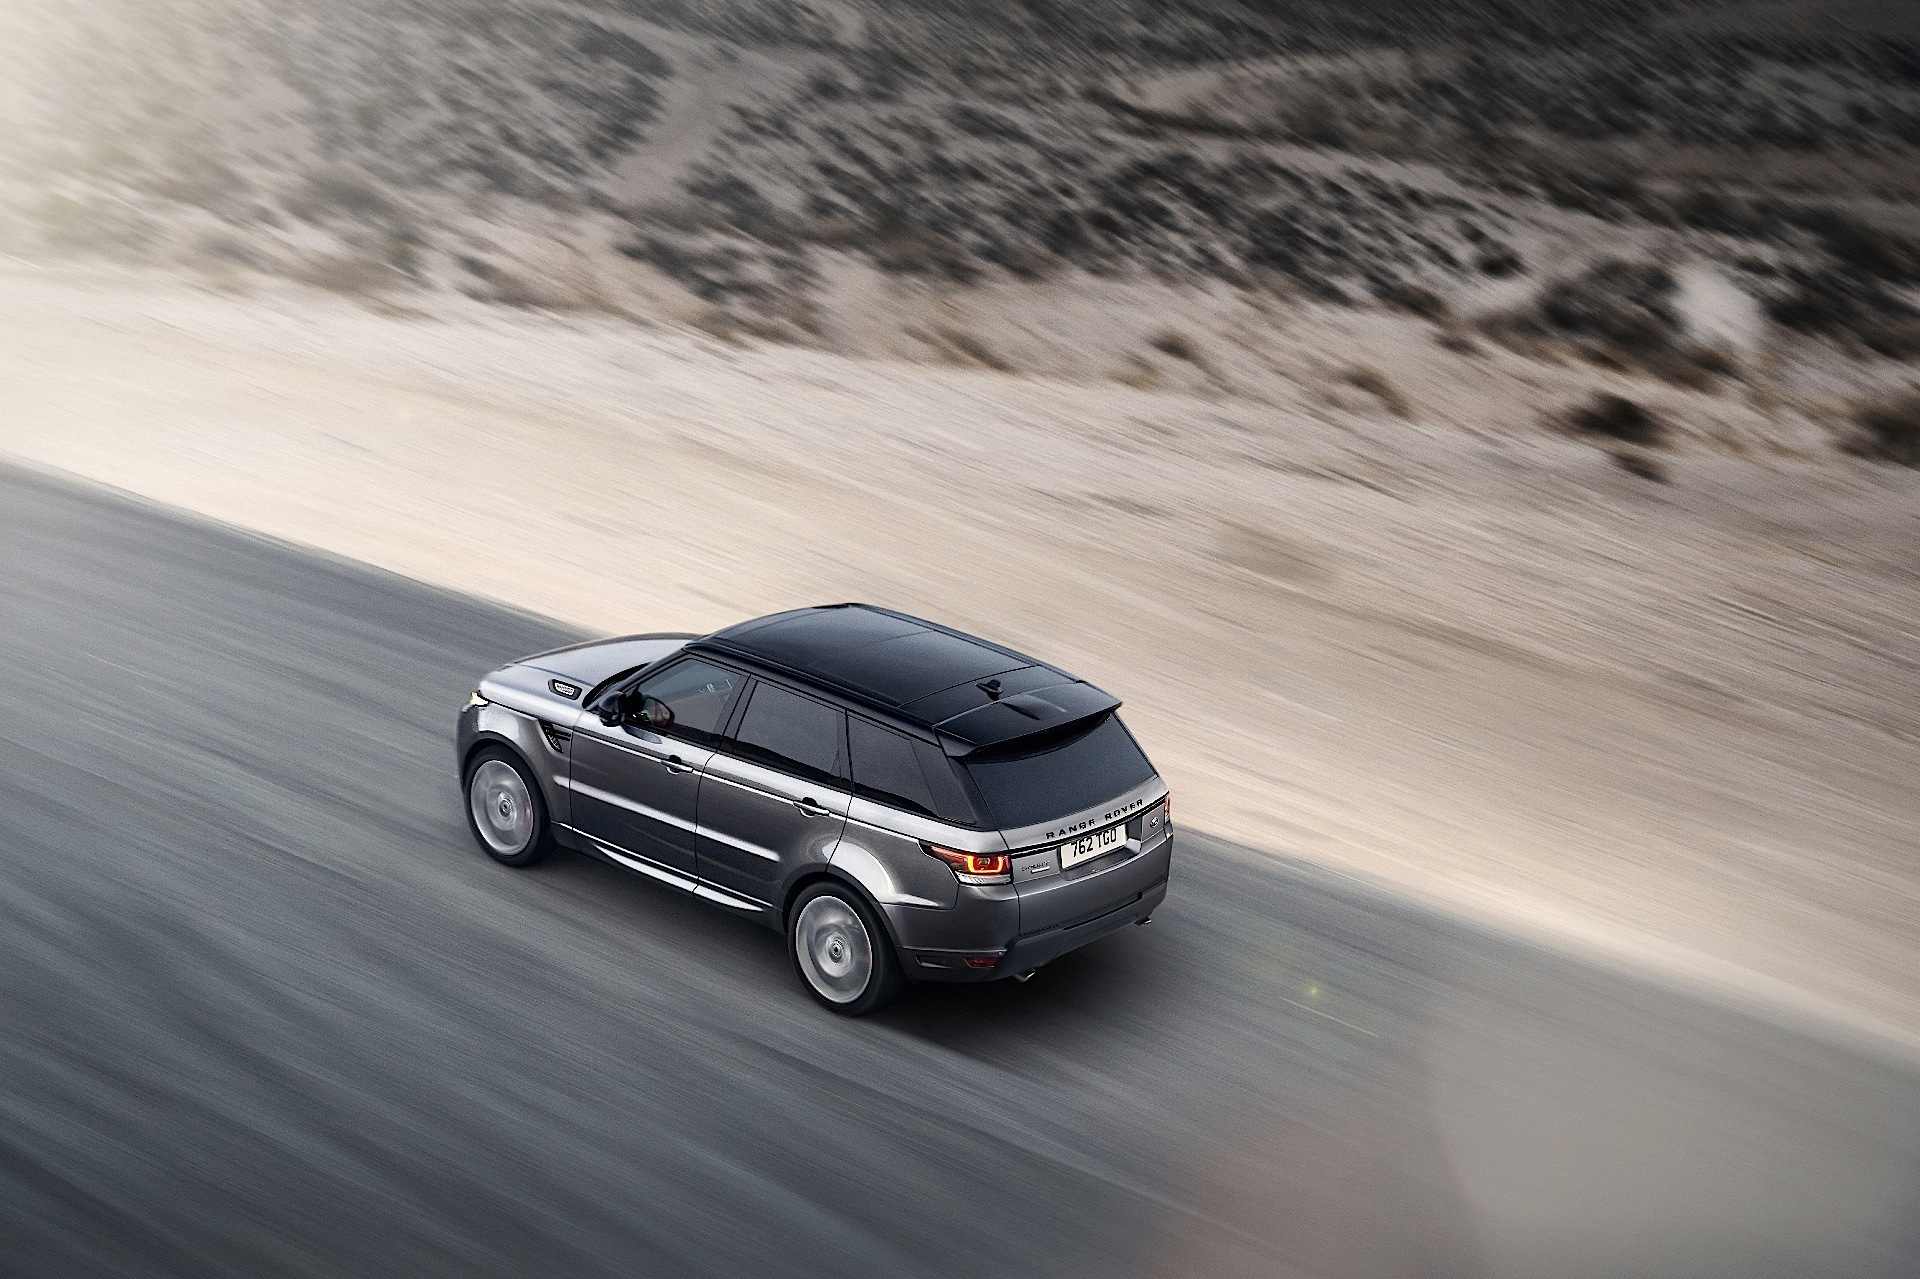 LAND ROVER Range Rover Sport specs 2013 2014 2015 2016 2017